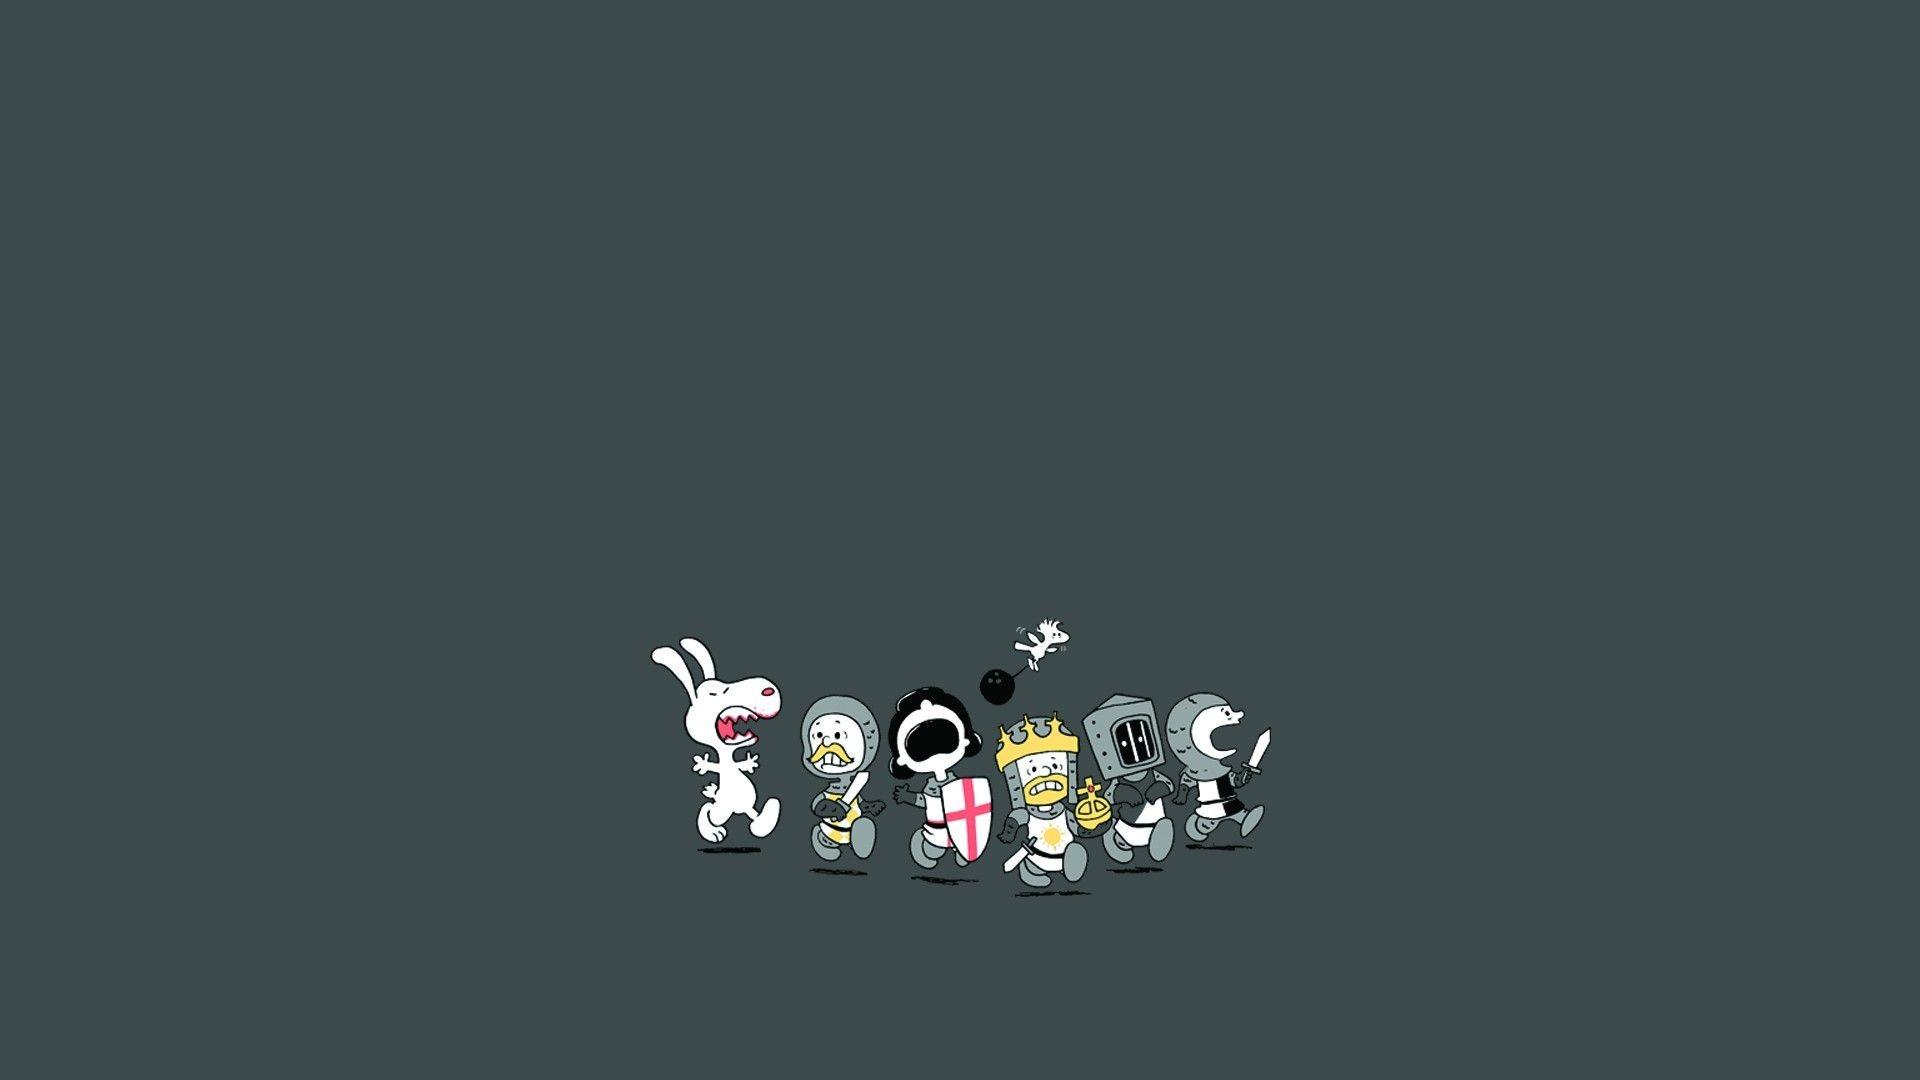 0 Monty Python Wallpapers Monty Python Wallpapers Group